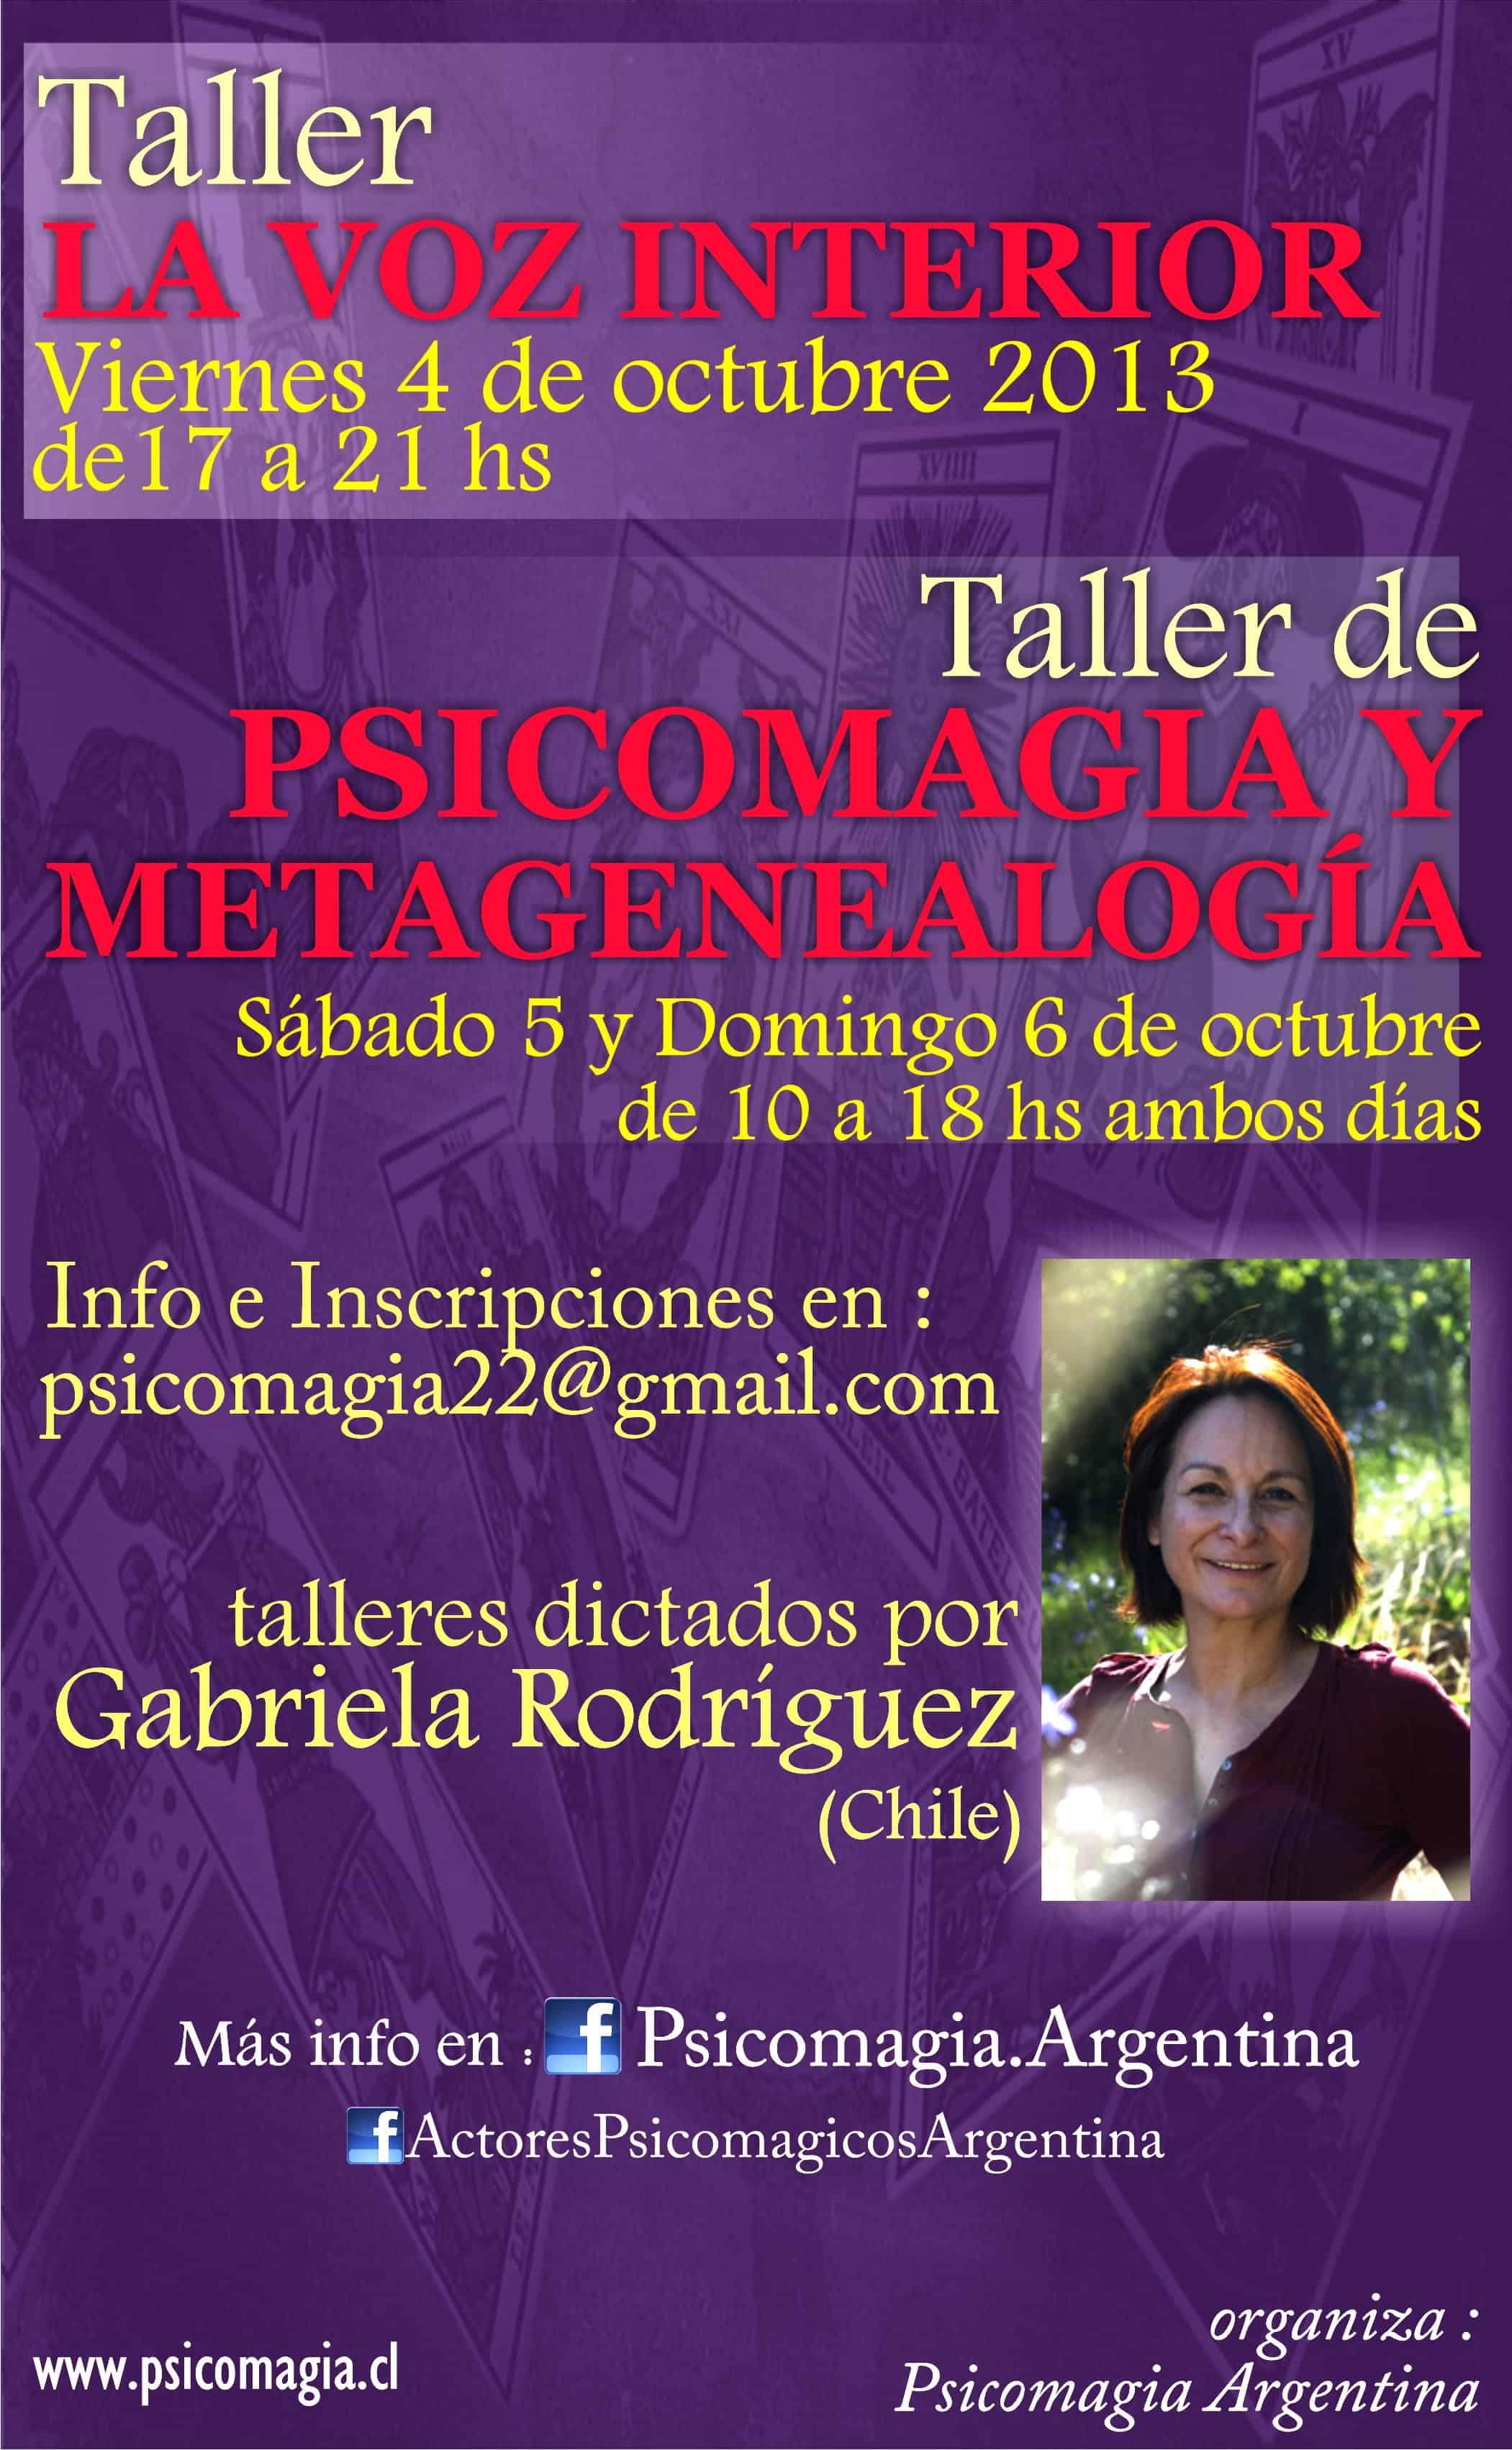 TALLERES OCTUBRE 2013 PSICOMAGIA